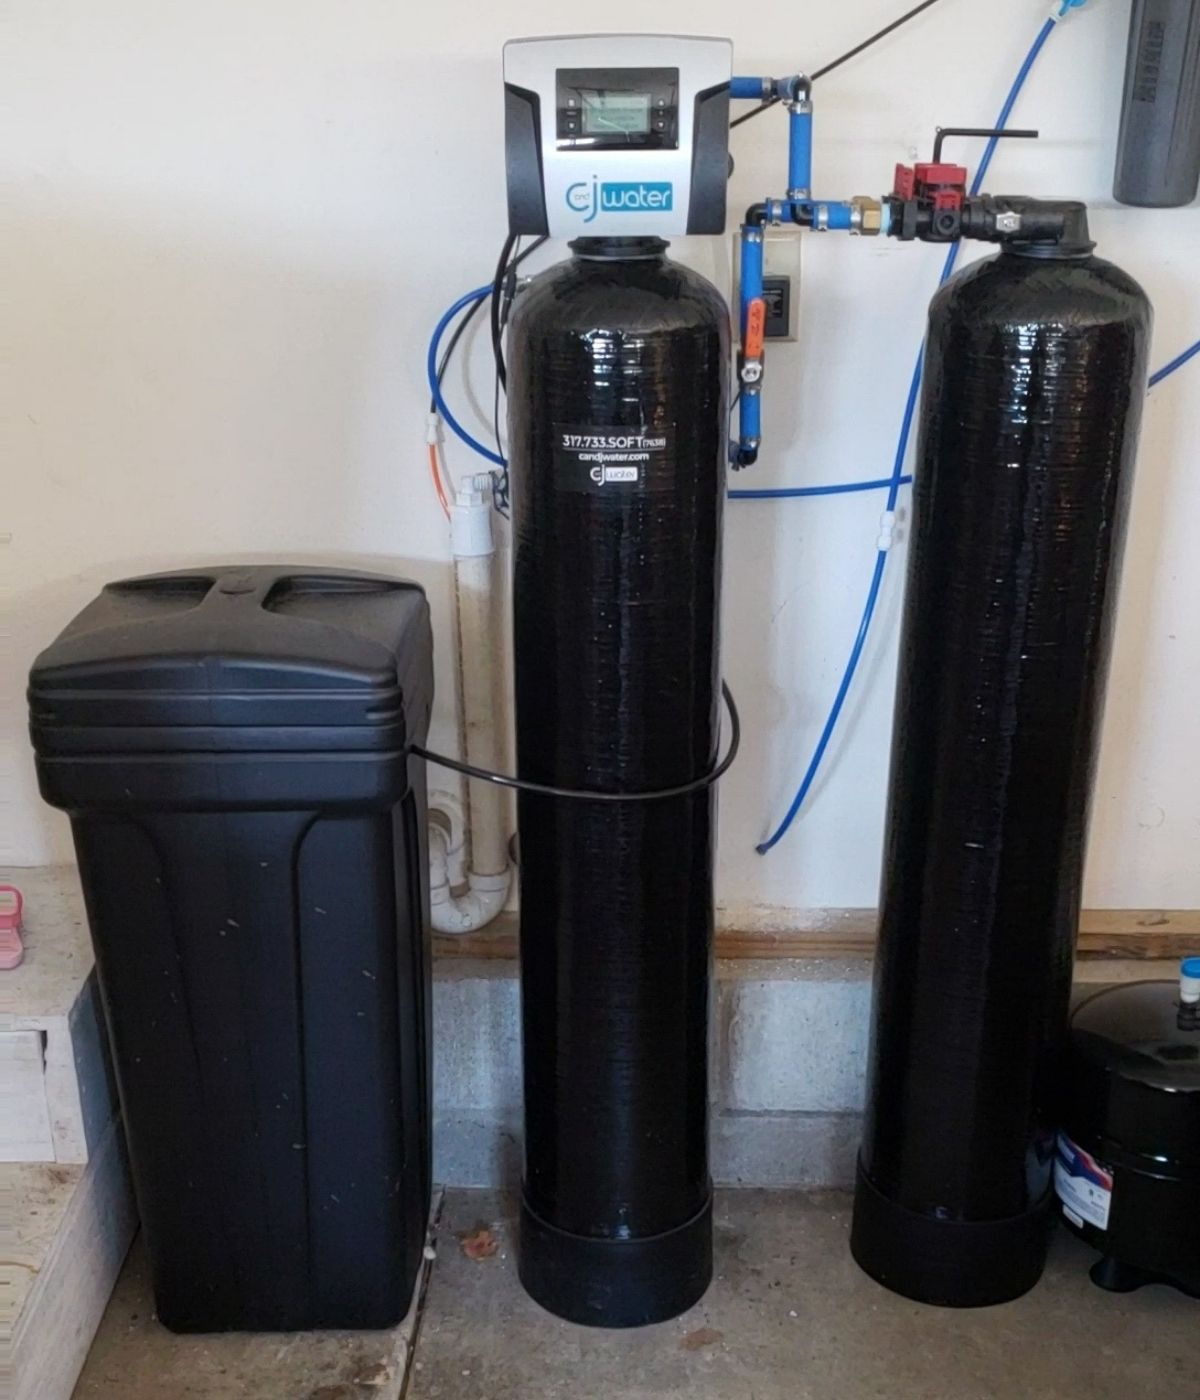 Avon water softening soltuions